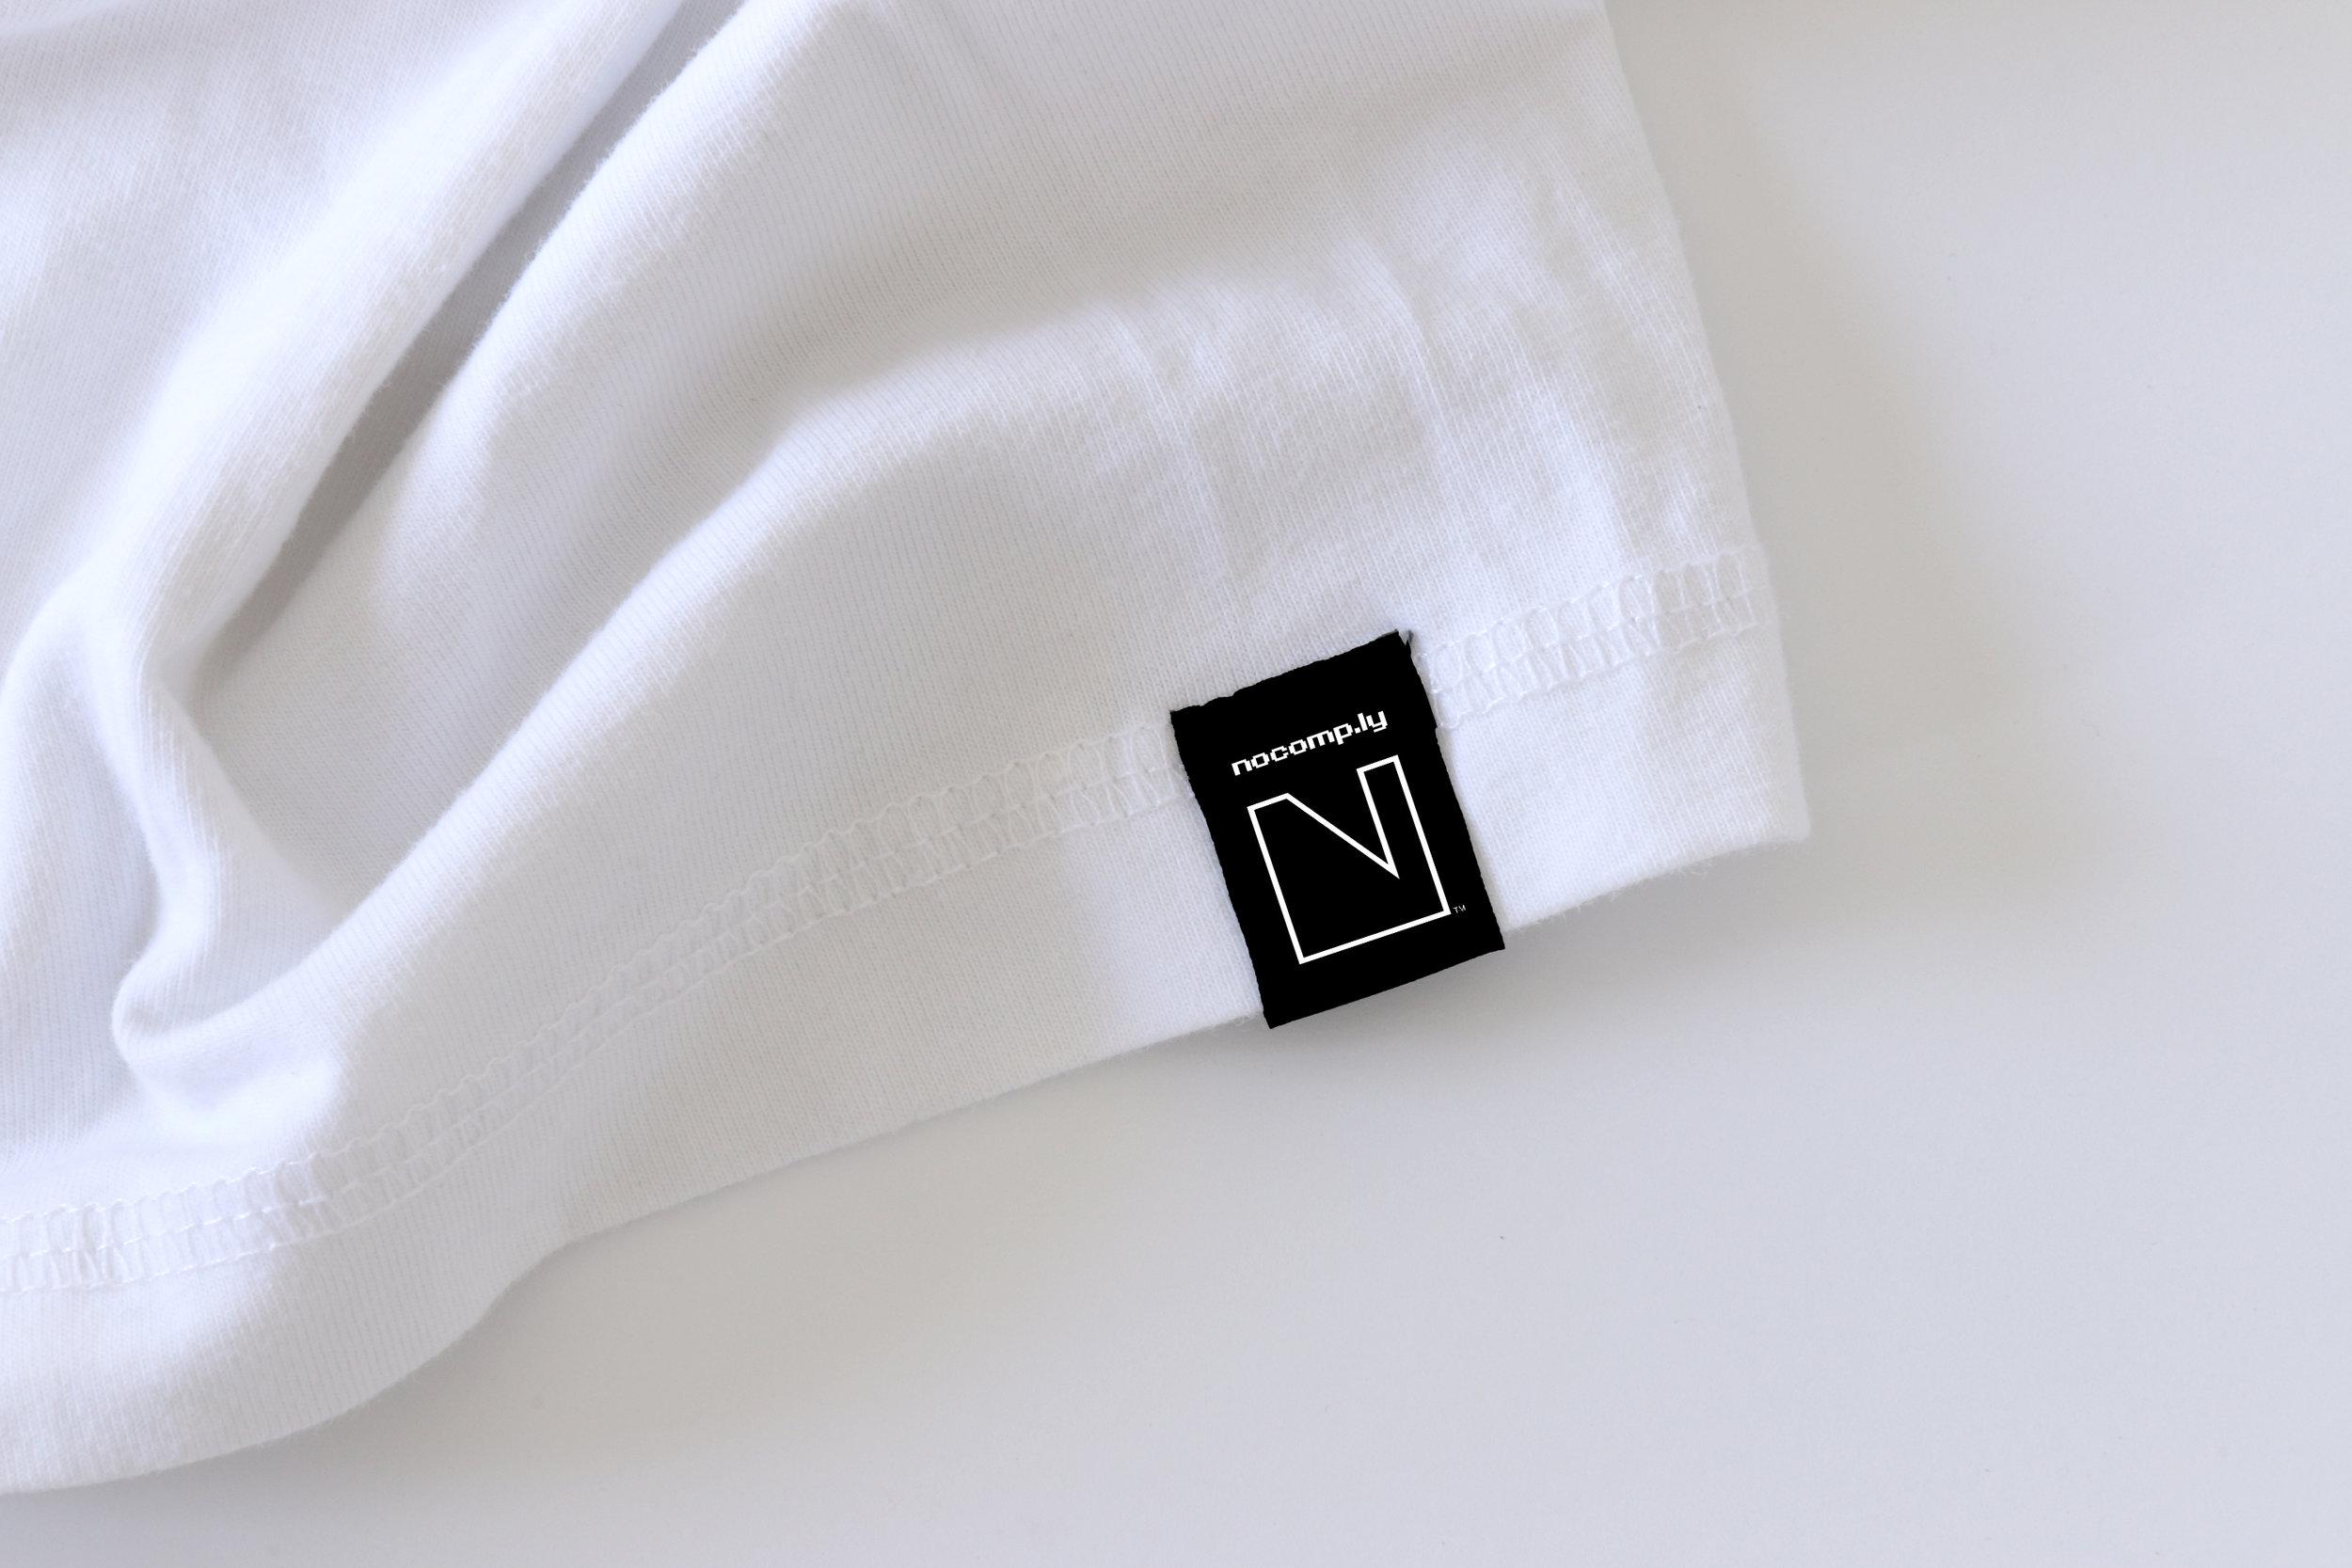 3D_shirt-tag_3000w.jpg